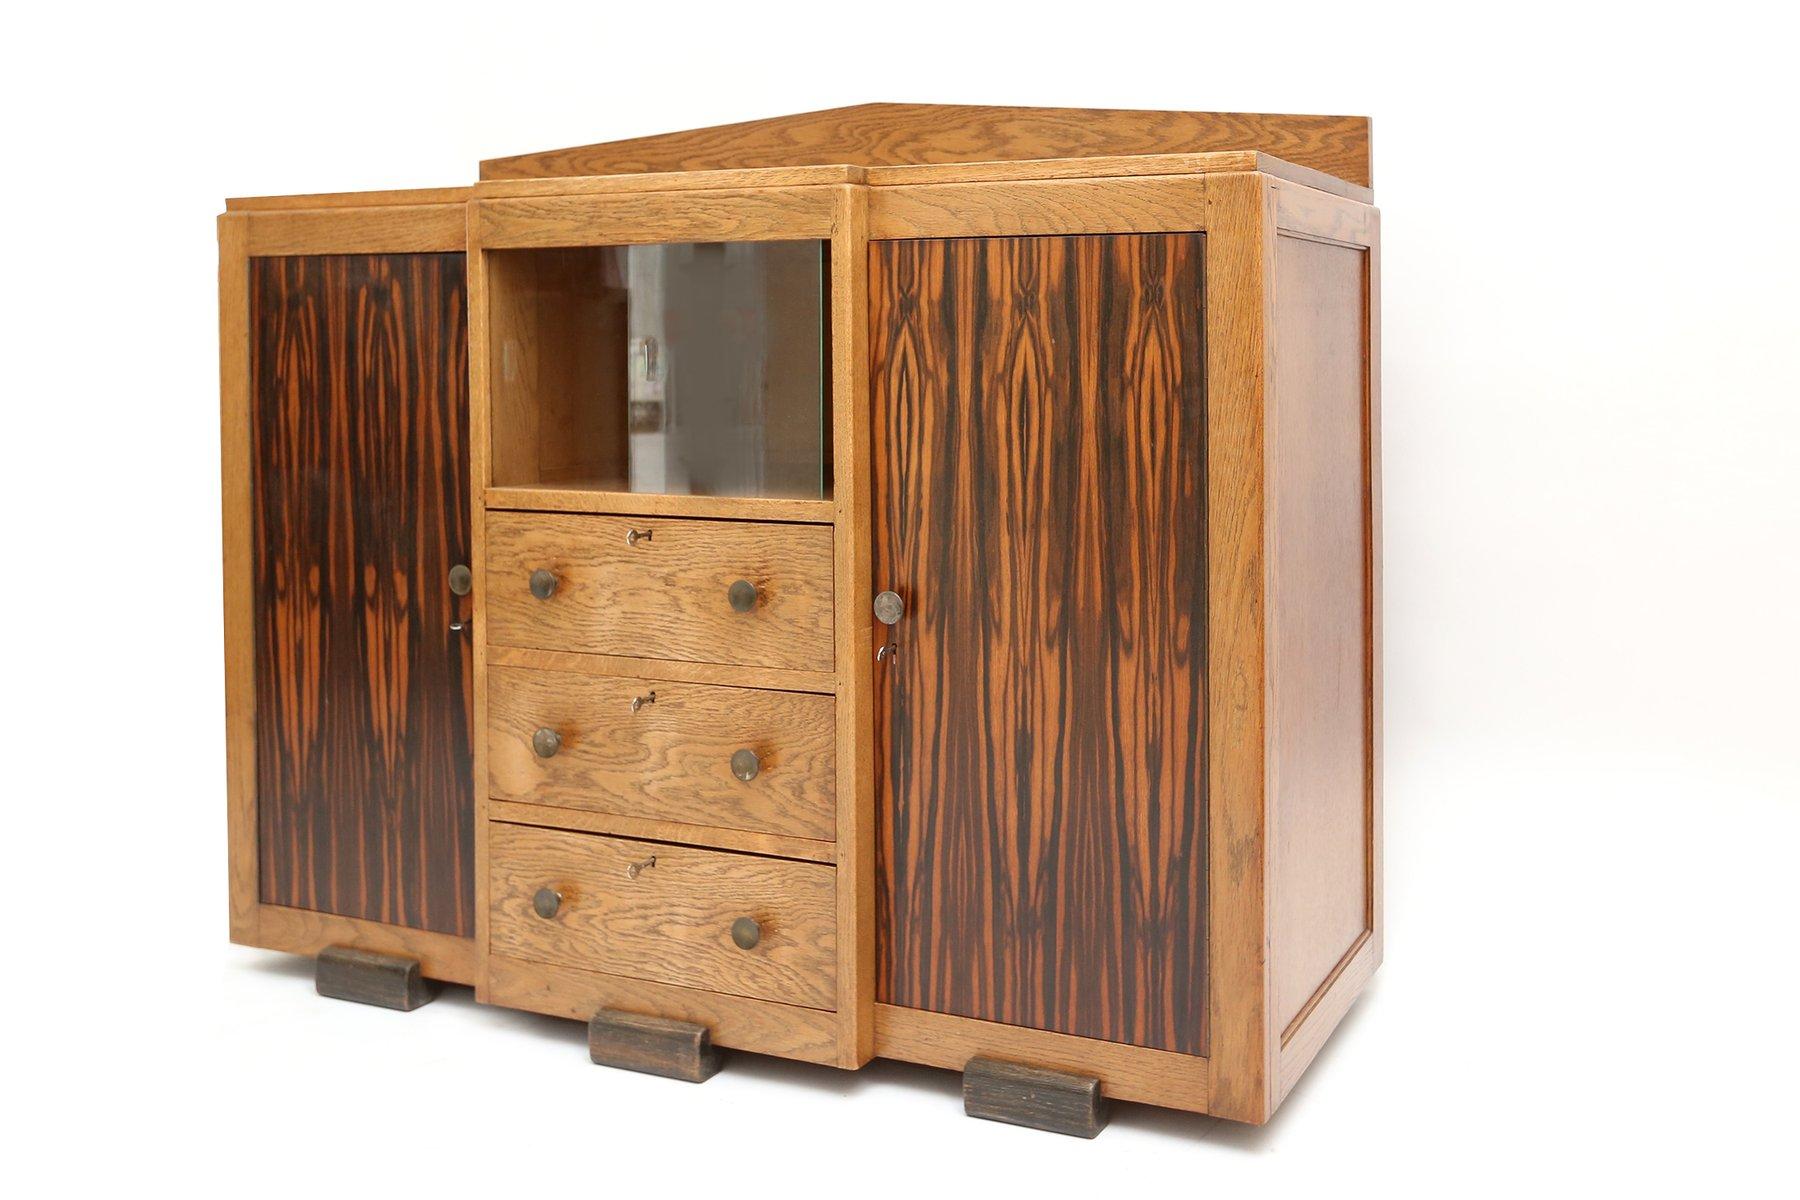 gro er amsterdamer schule schrank 1920er bei pamono kaufen. Black Bedroom Furniture Sets. Home Design Ideas